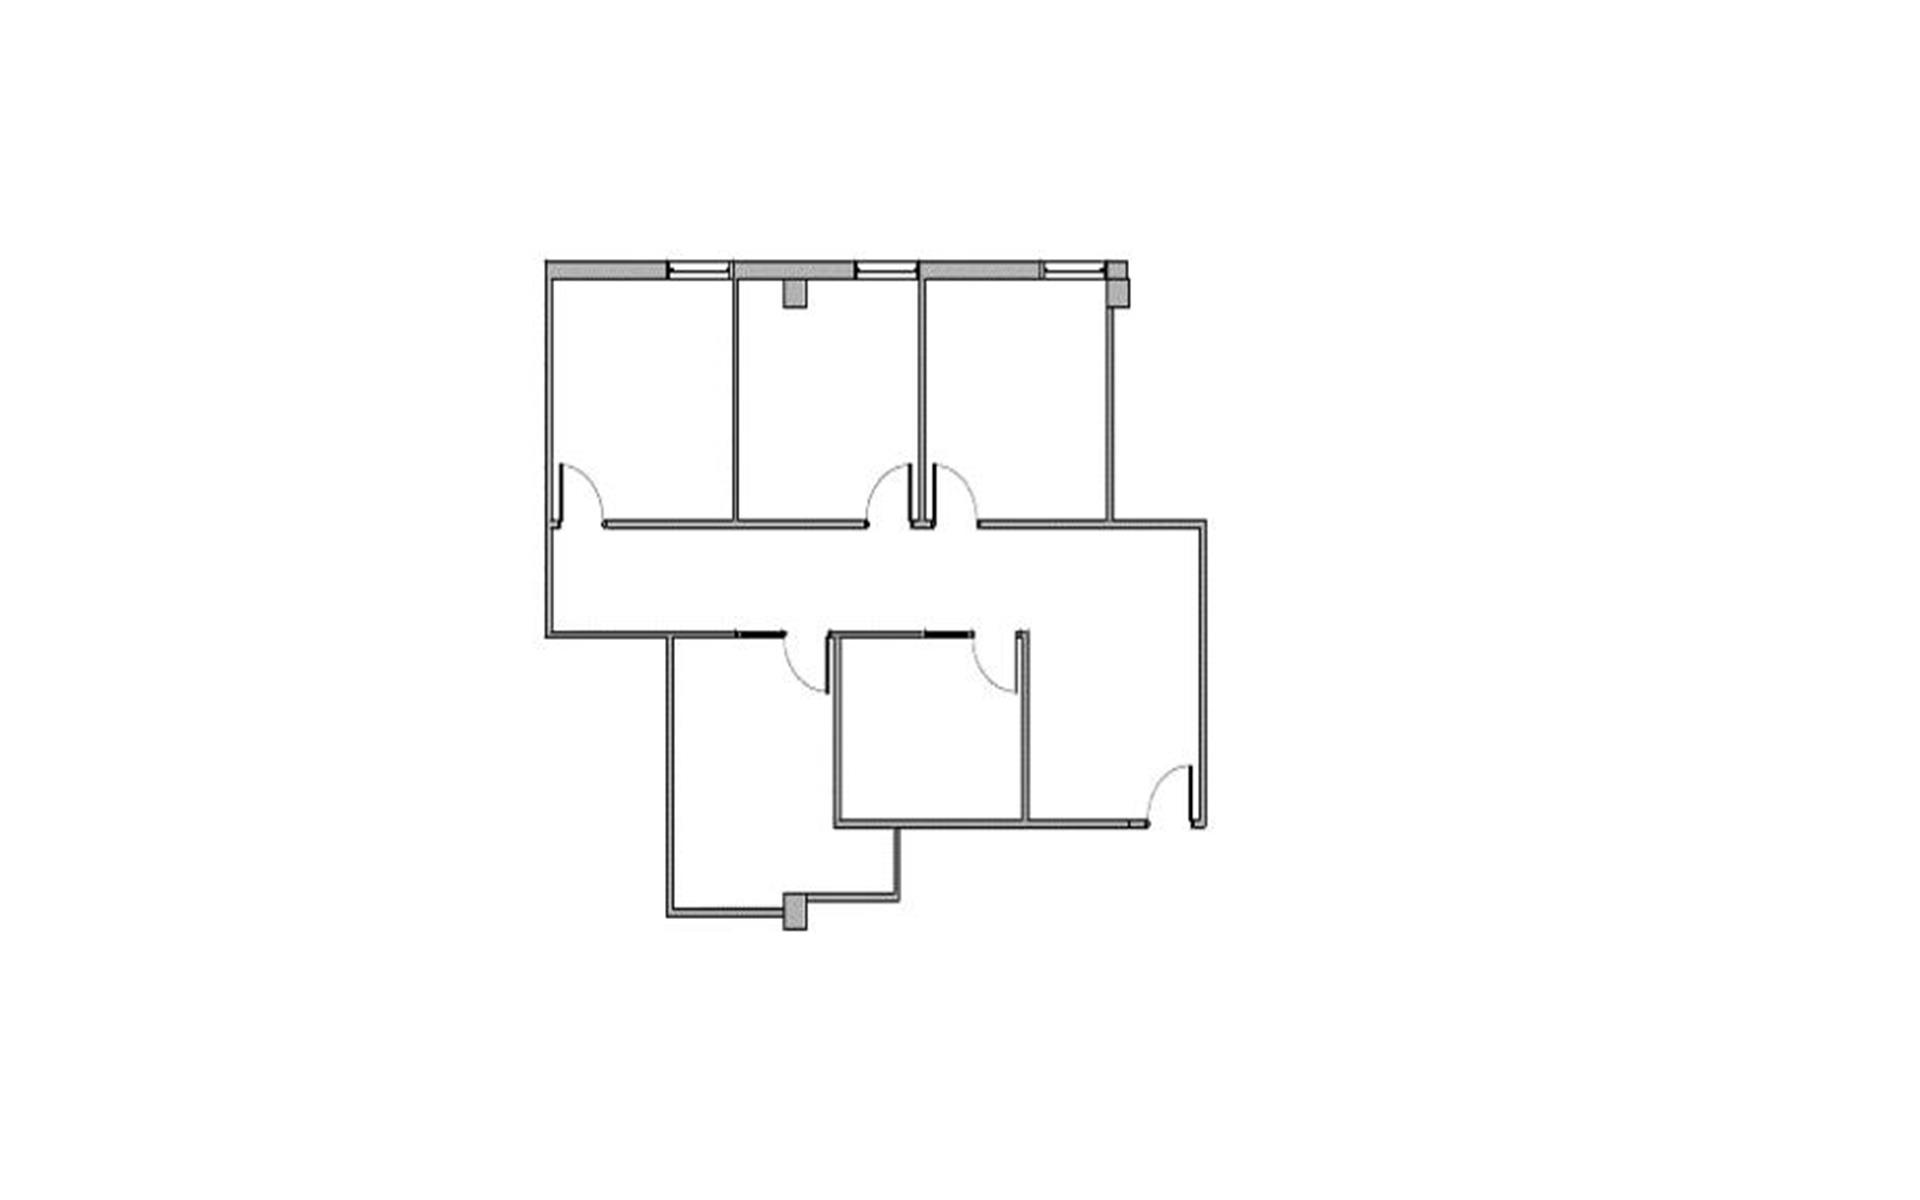 Boxer - 2323 South Voss - Team Office | Suite 601